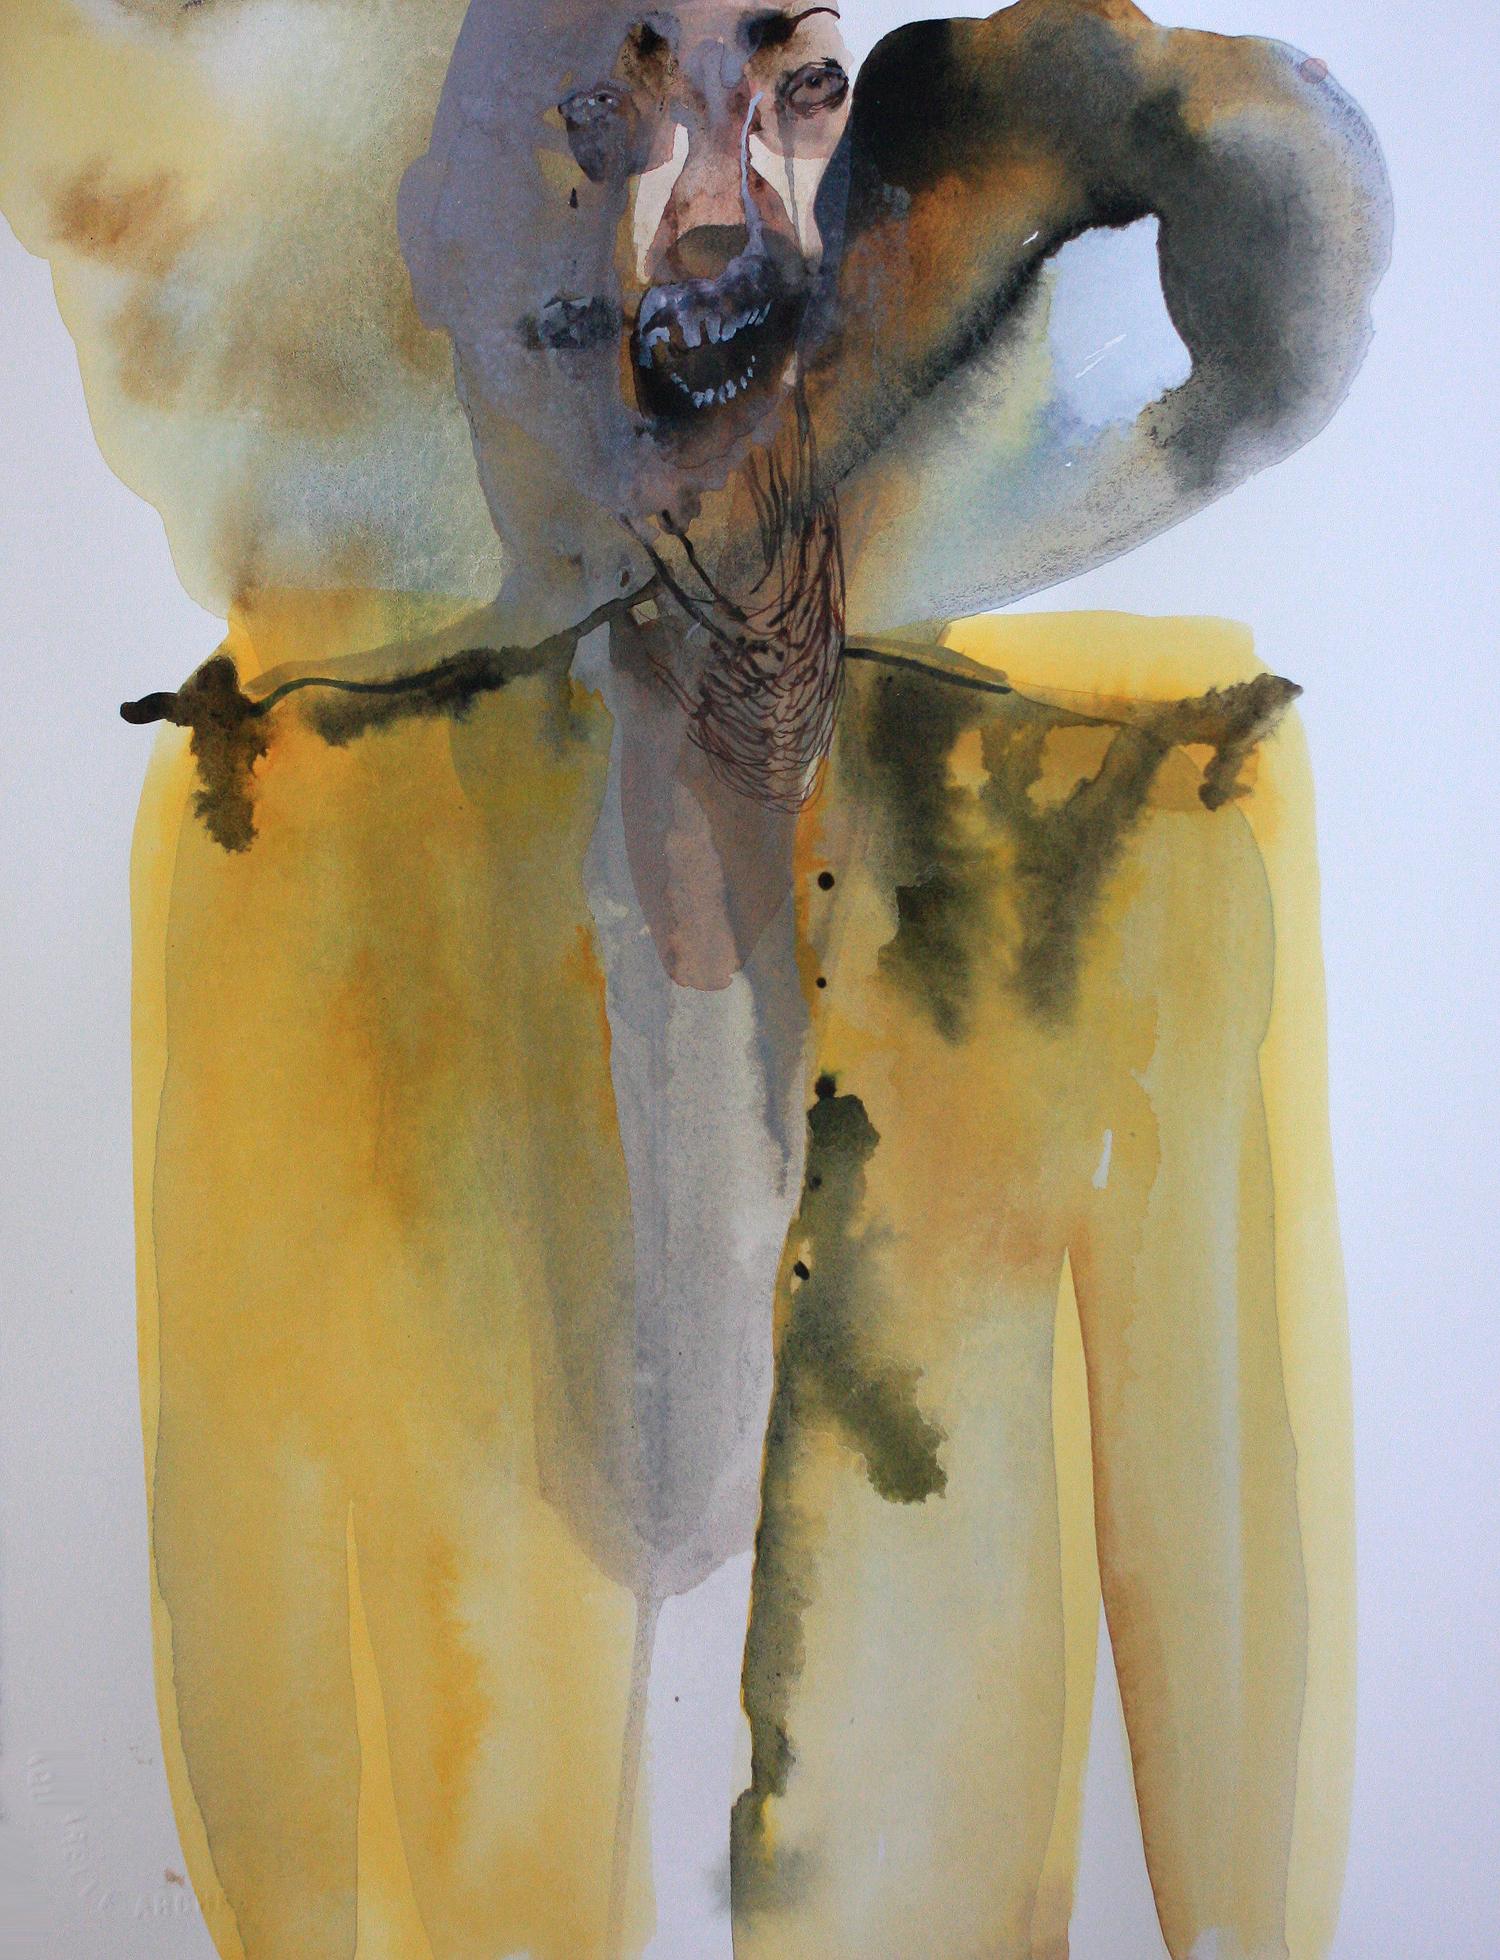 Throat King by Maja Ruznic